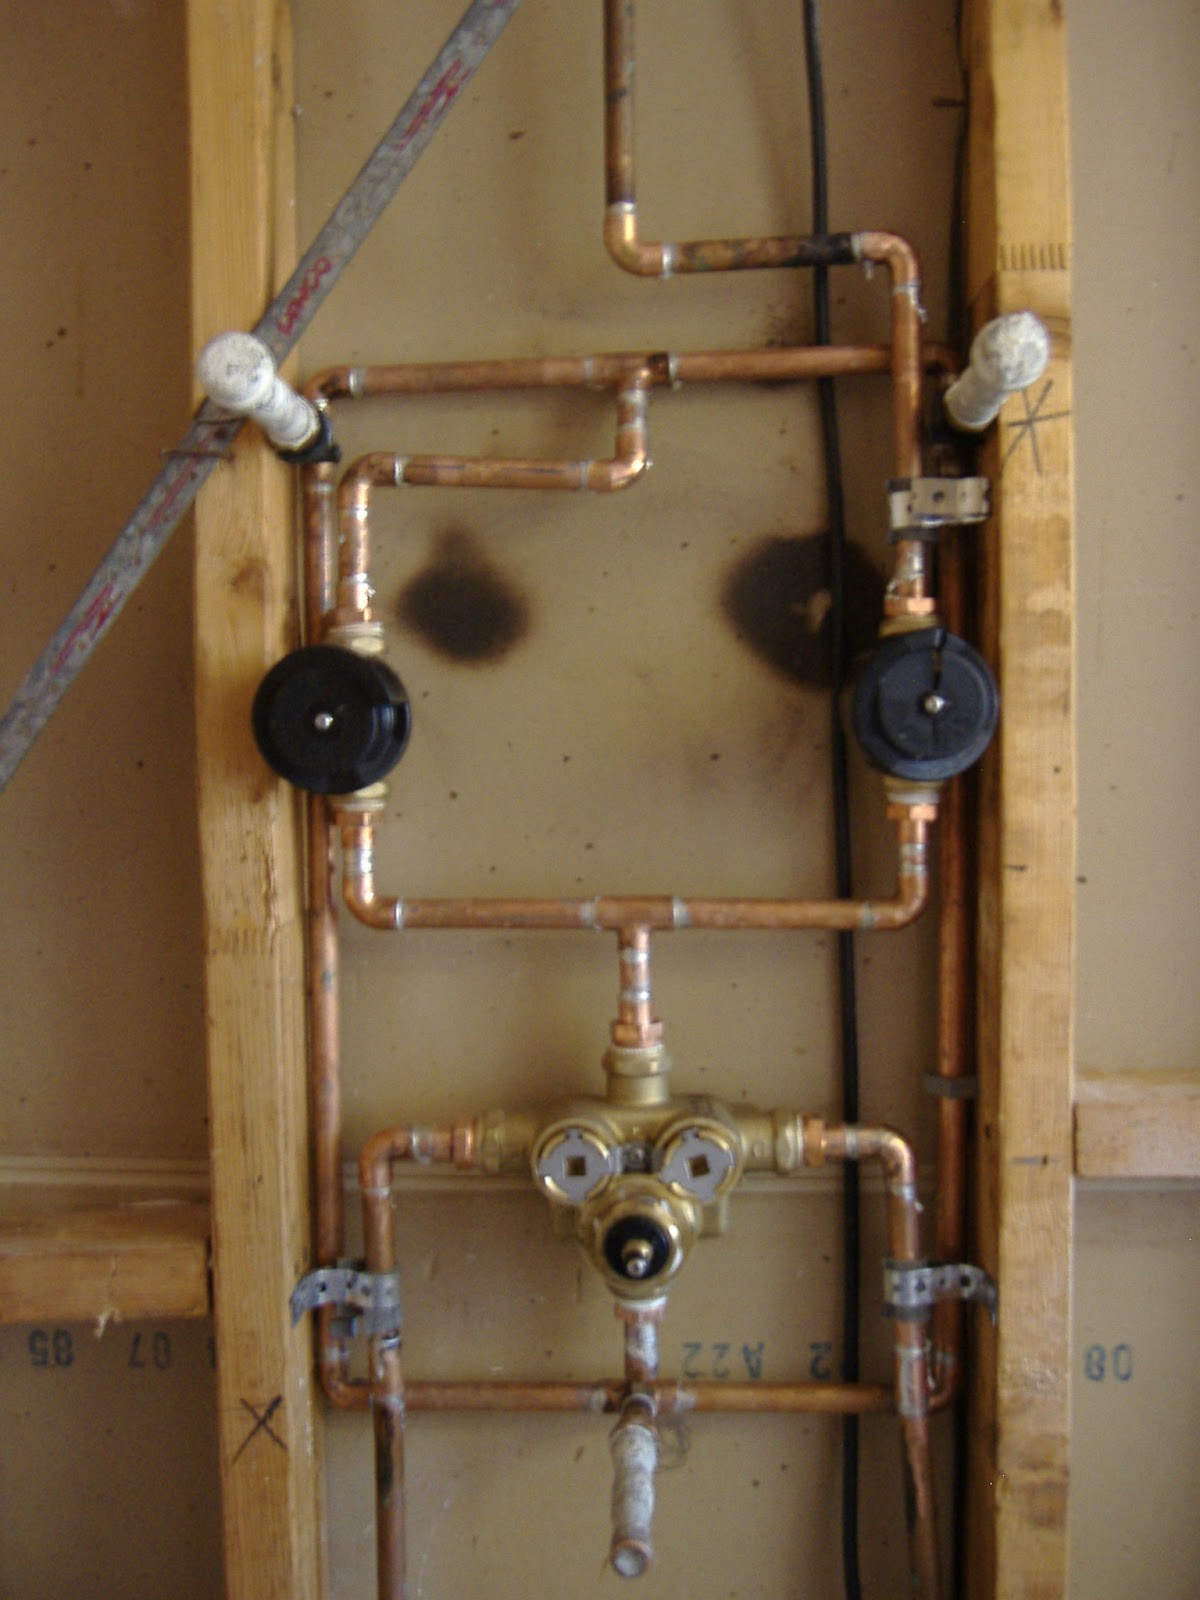 shower diverter valve diagram 1973 vw beetle headlight switch wiring plumbing valves with